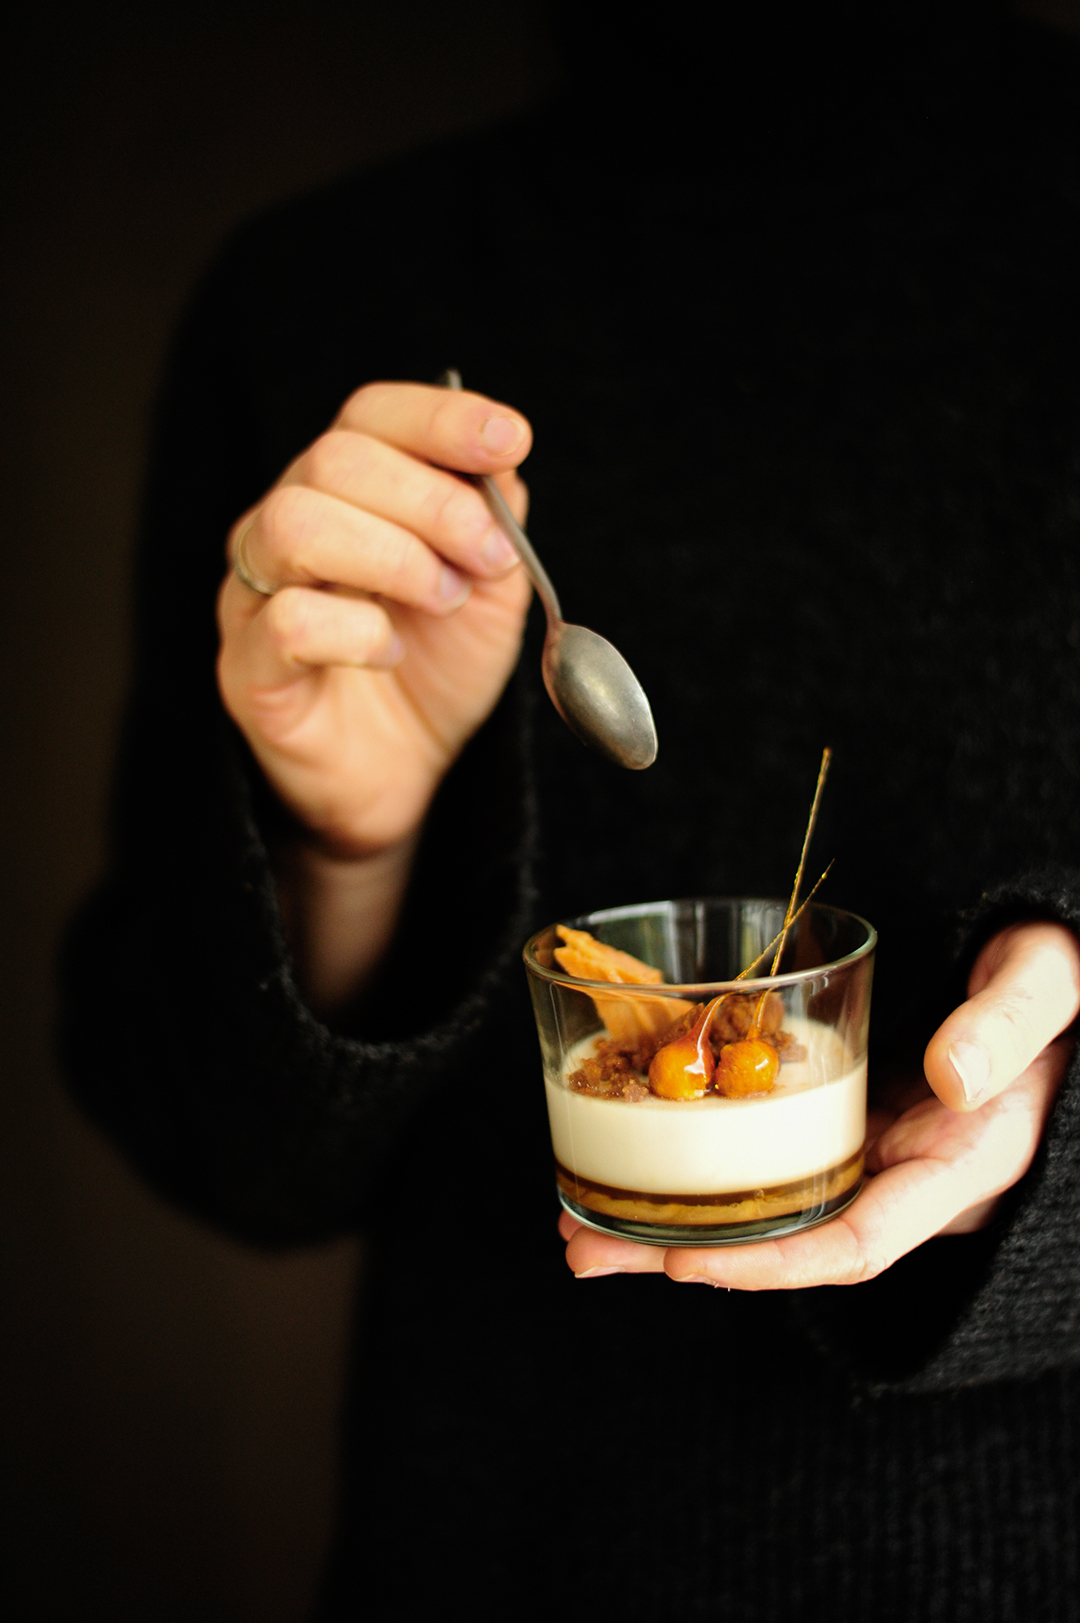 serving dumplings | Panna cotta ze słonym karmelem i chrupiącymi ciasteczkami